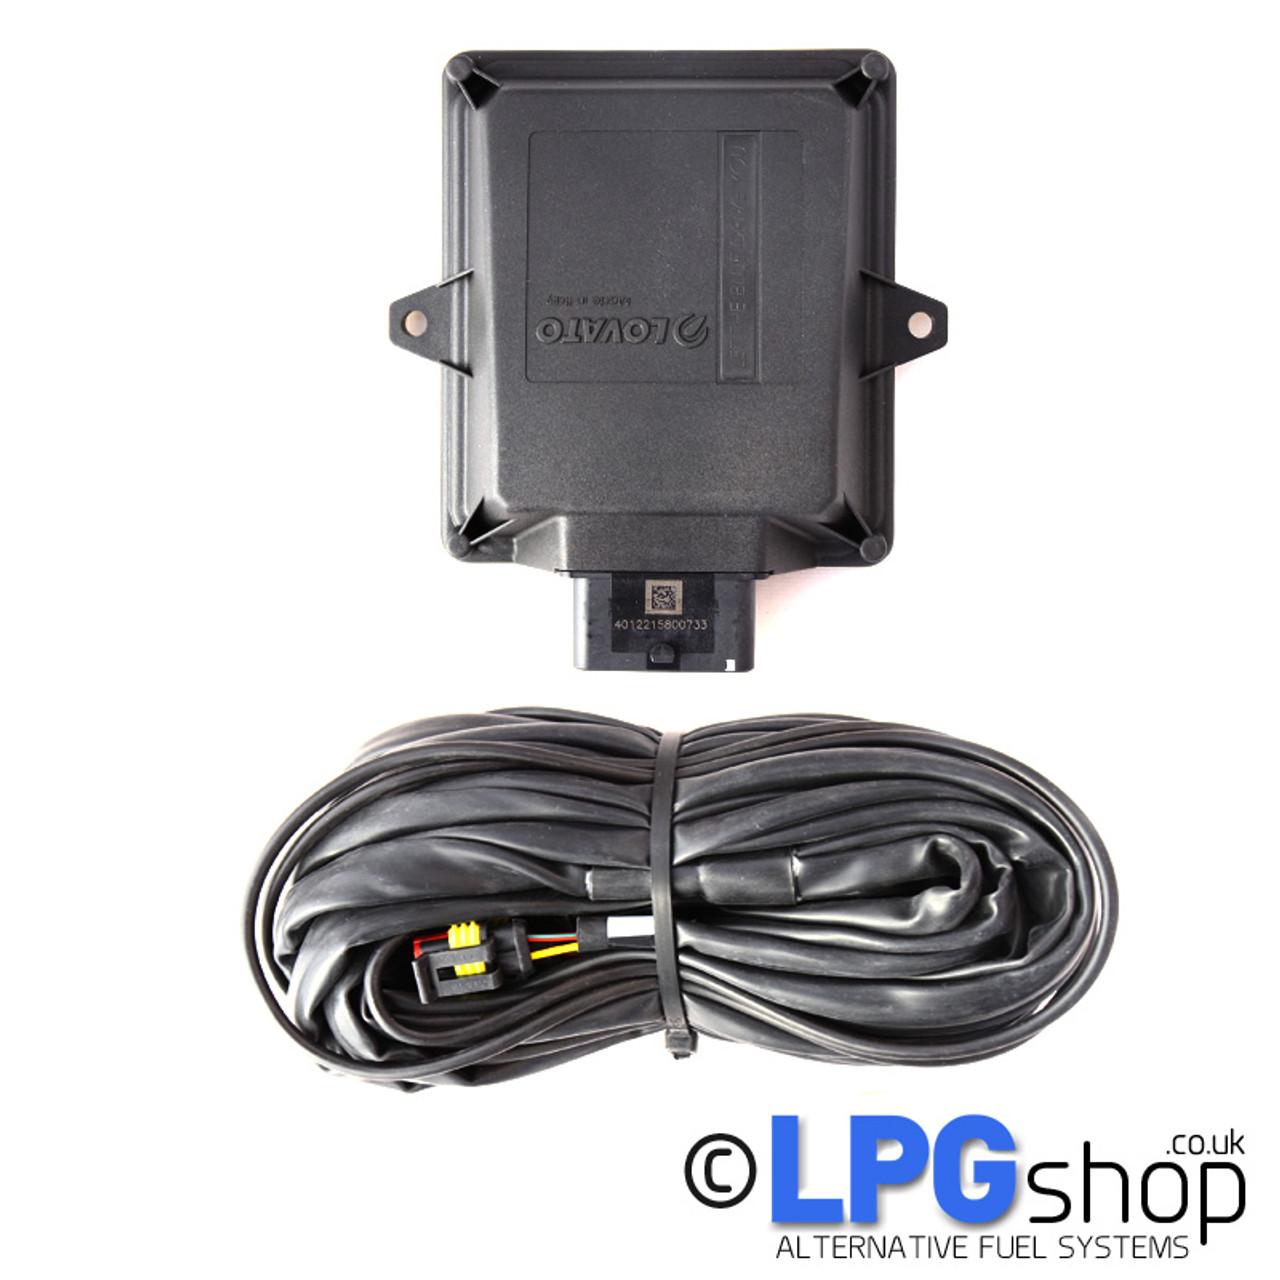 lovato smart 4 cylinder reducer mini kit rh lpgshop co uk Basic Electrical Wiring Diagrams Wiring Diagram Symbols